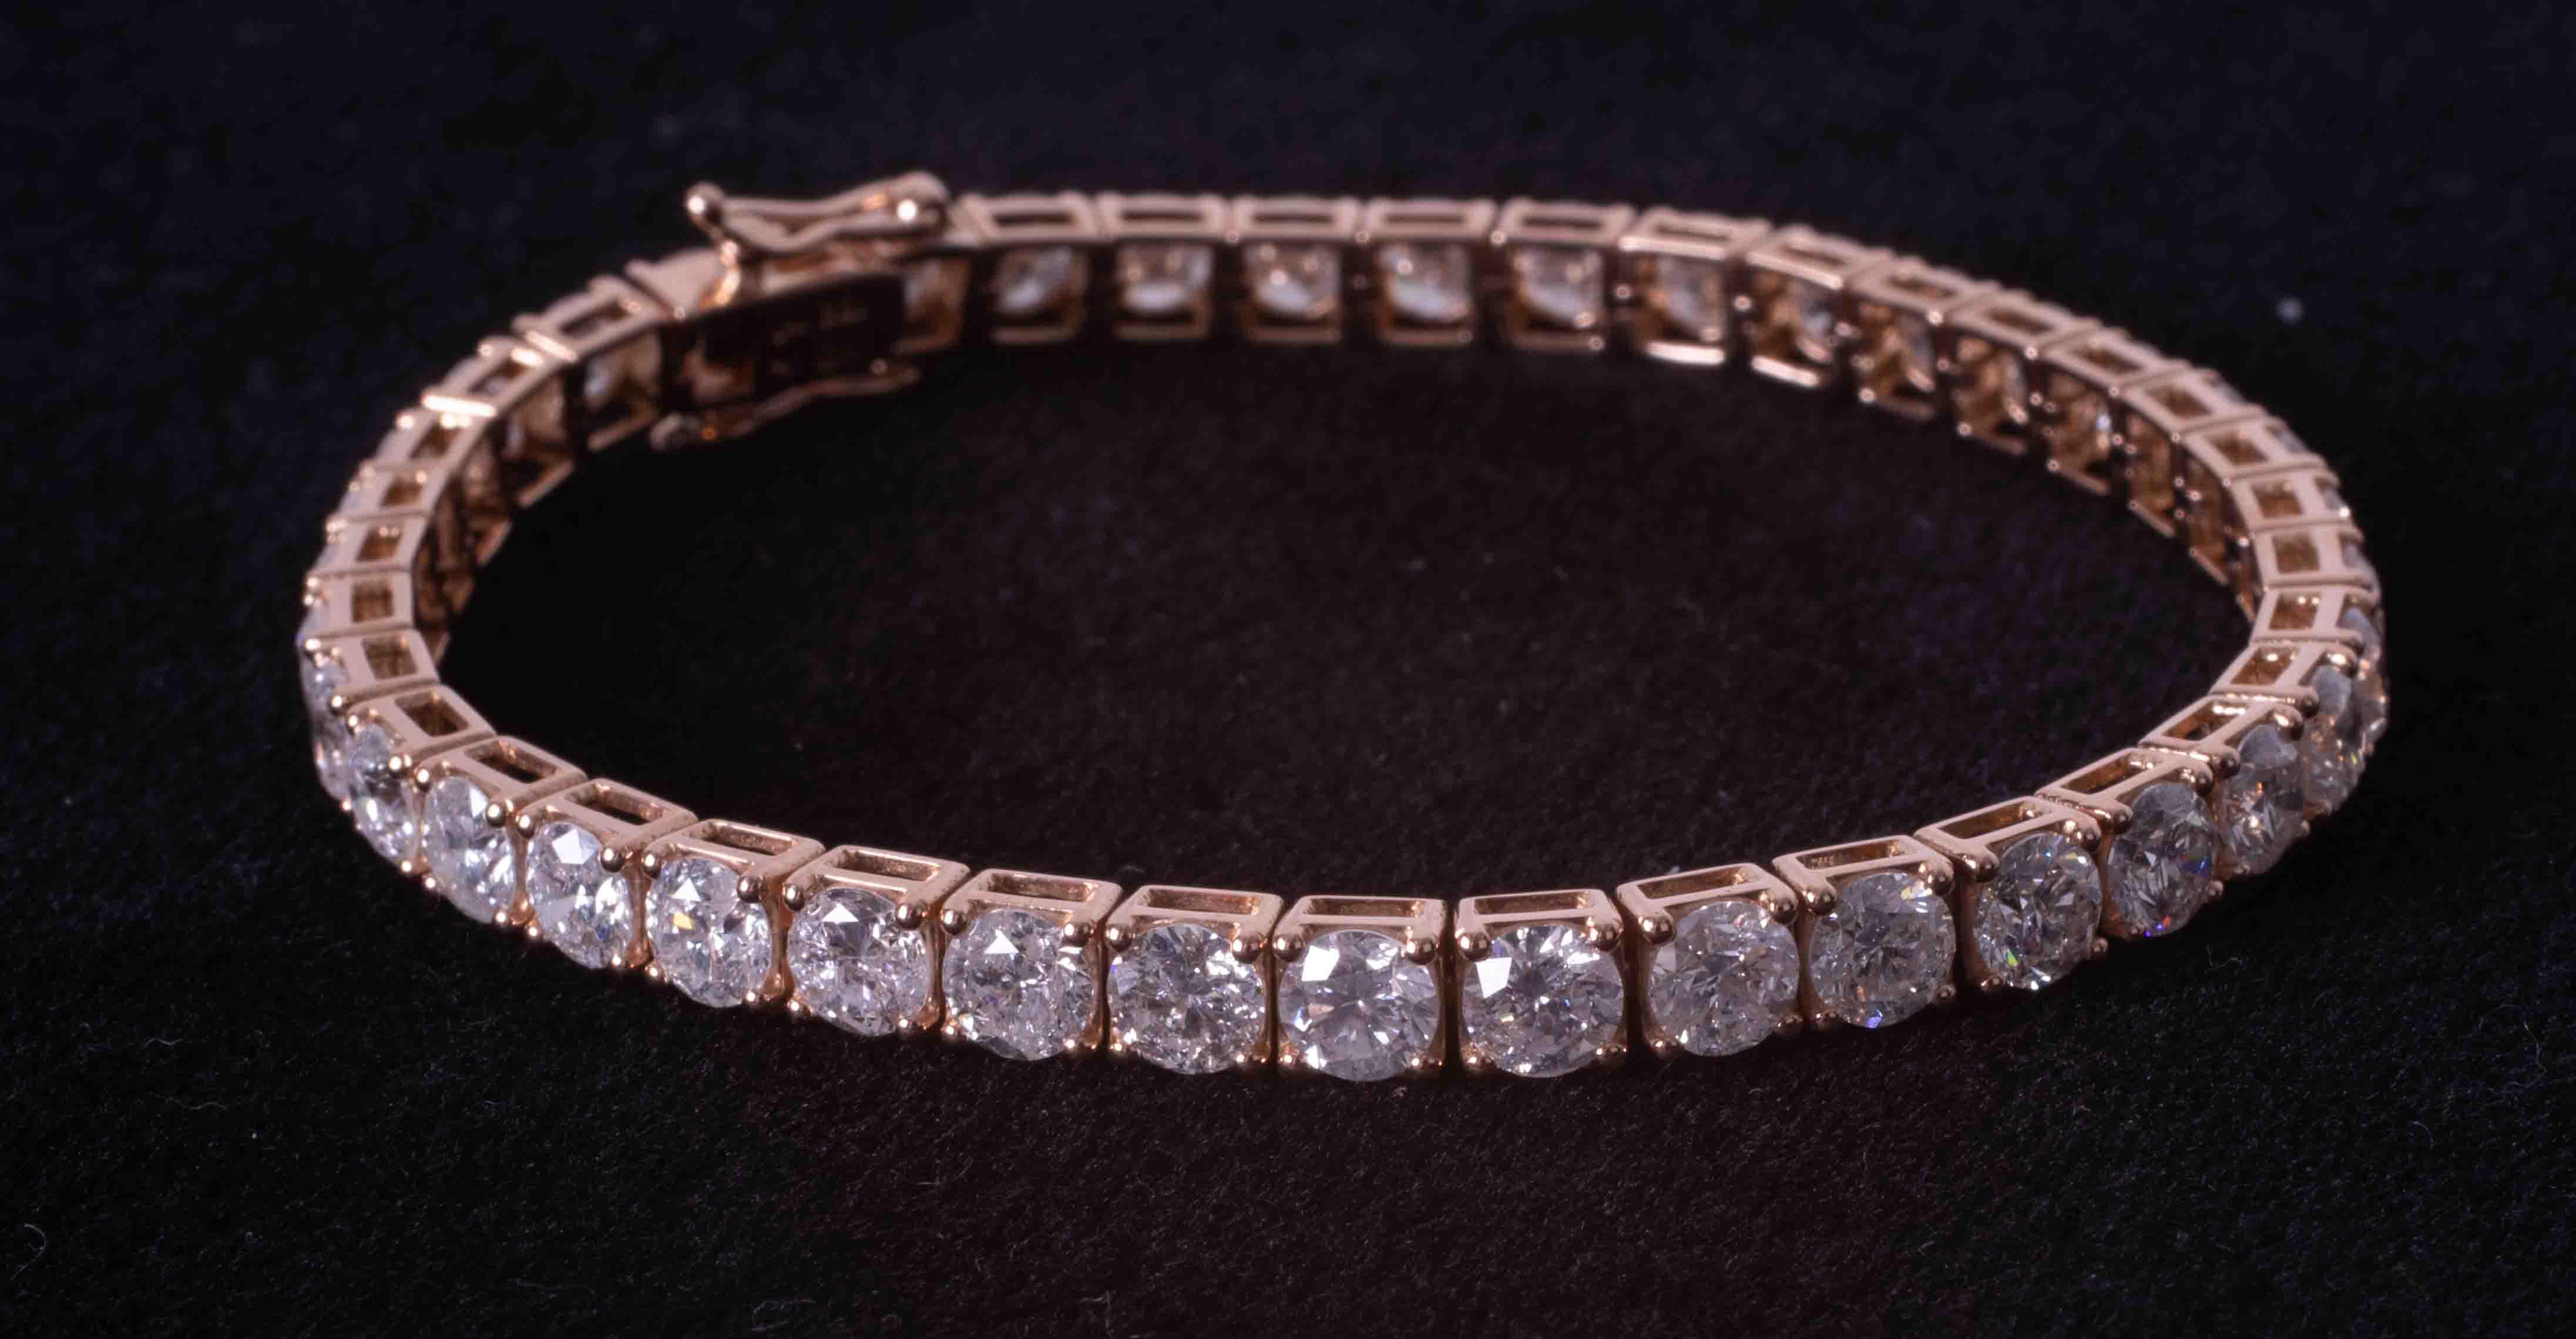 An impressive 18ct rose gold (stamped 18k) tennis bracelet set 39 round brilliant cut diamonds, - Image 2 of 4